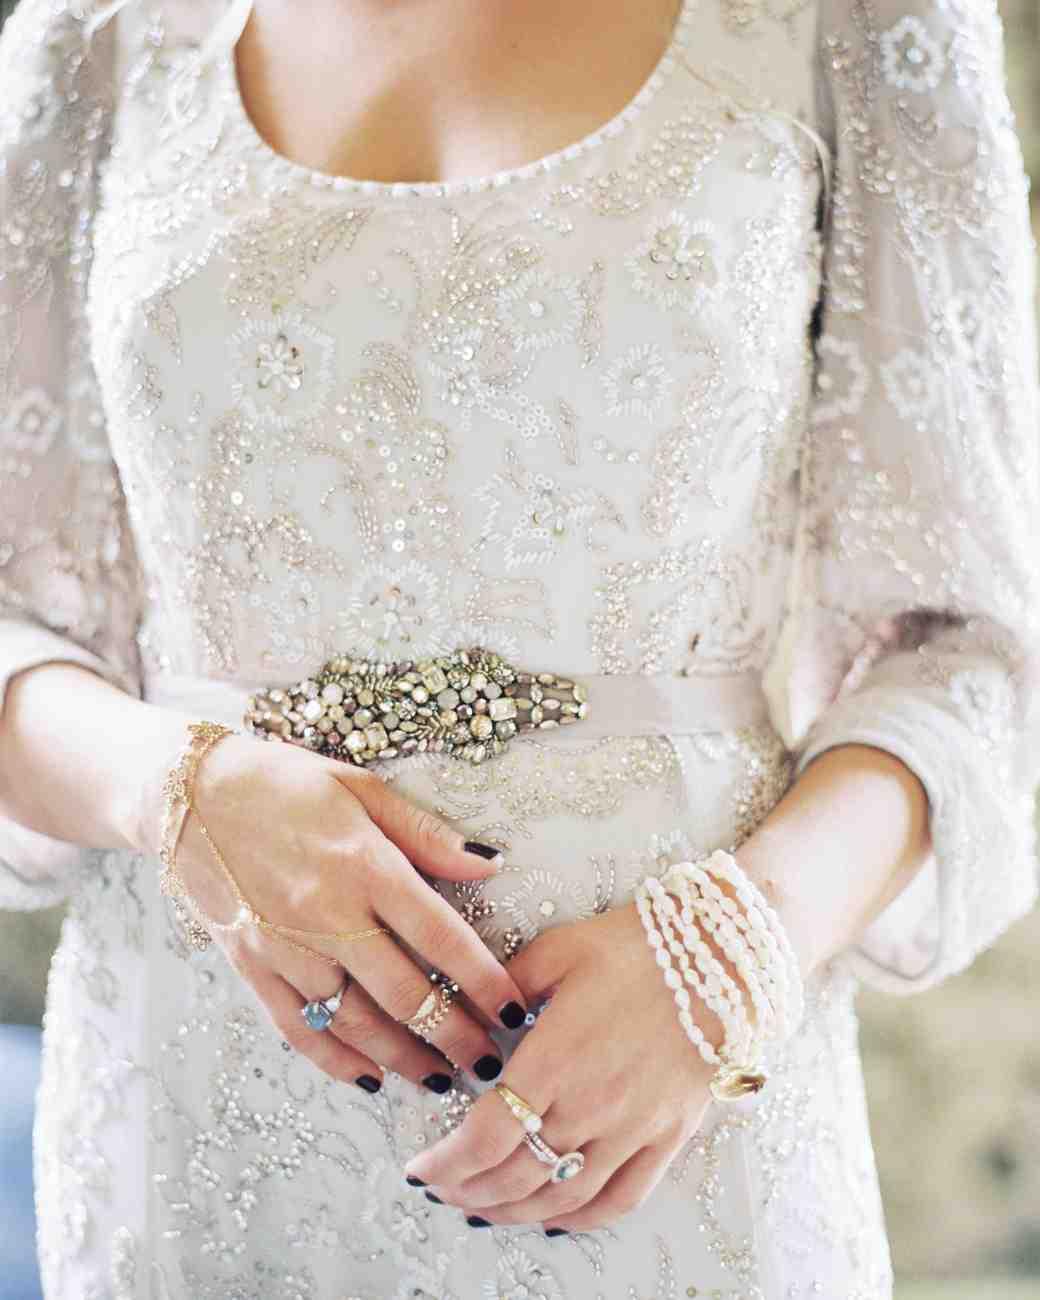 ginny-andrew-wedding-accessories-0282-s112676-0216.jpg